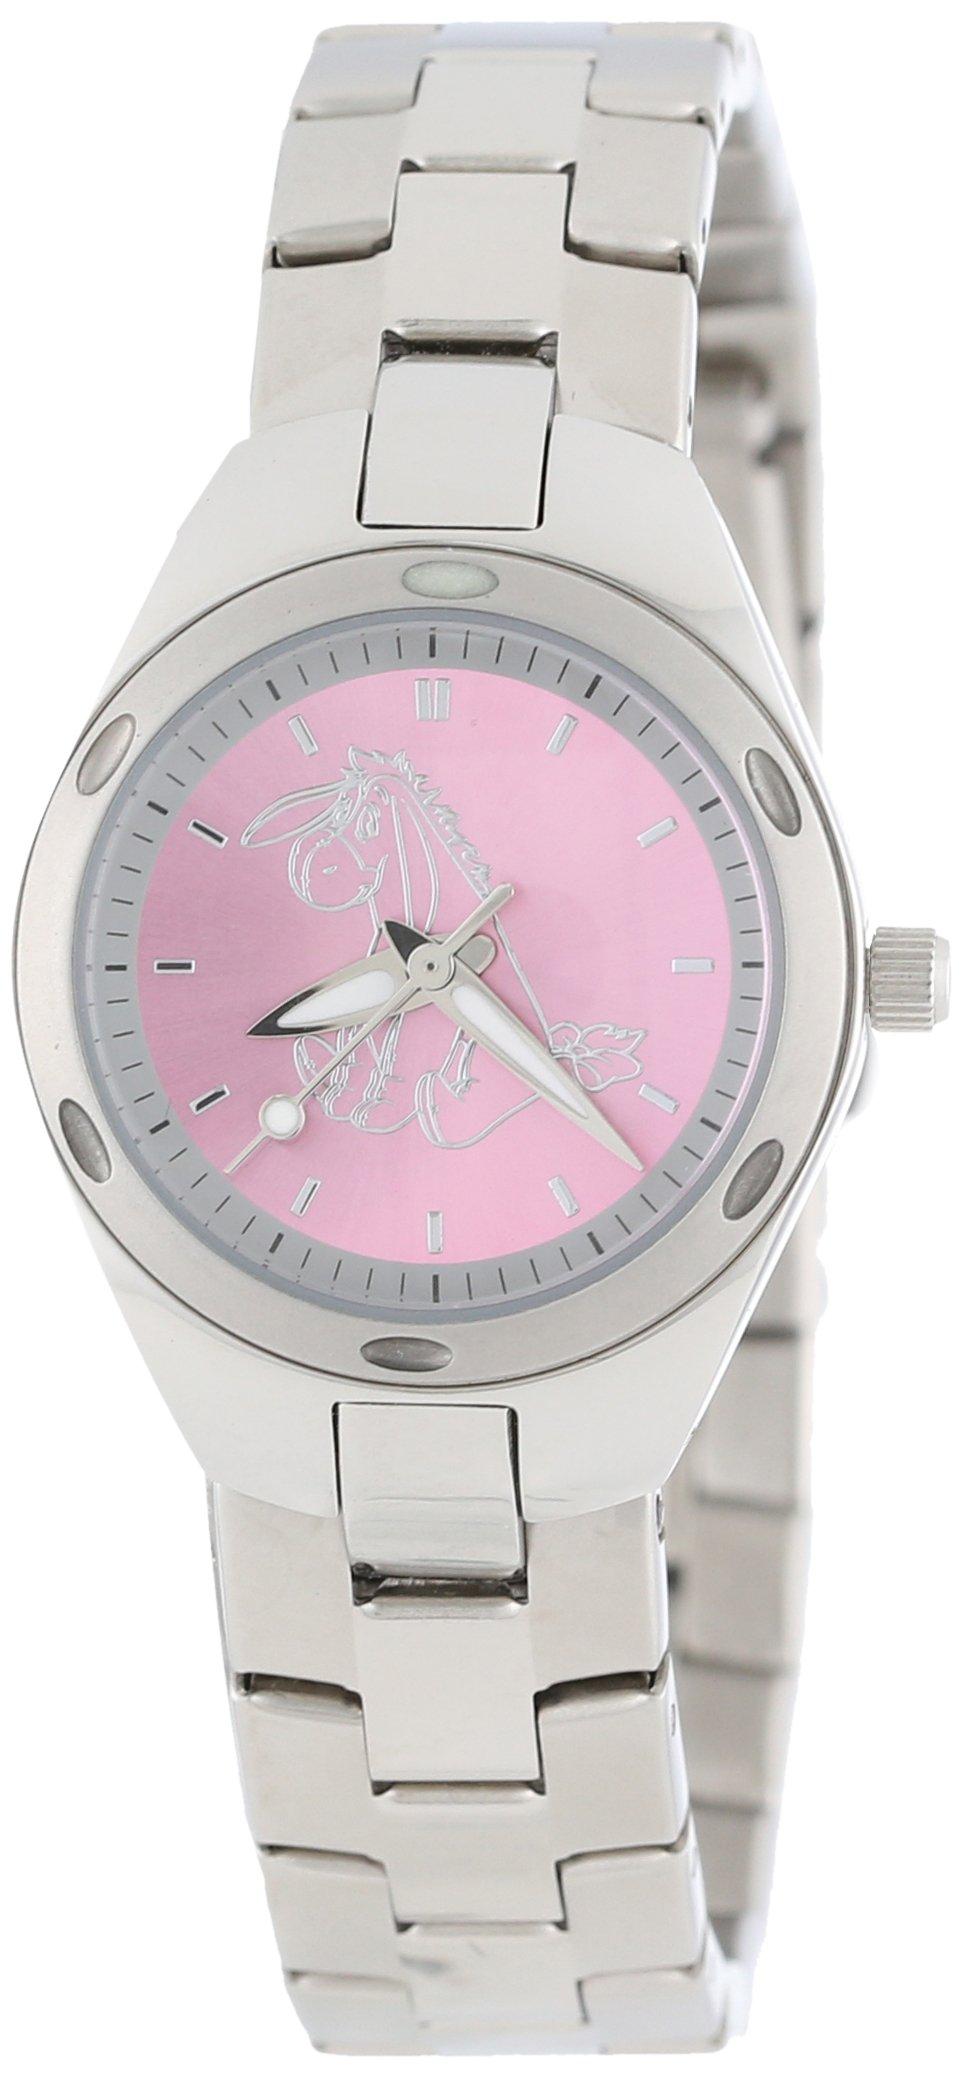 Disney Women's 59006-6 Stainless Steel Eeyore Watch